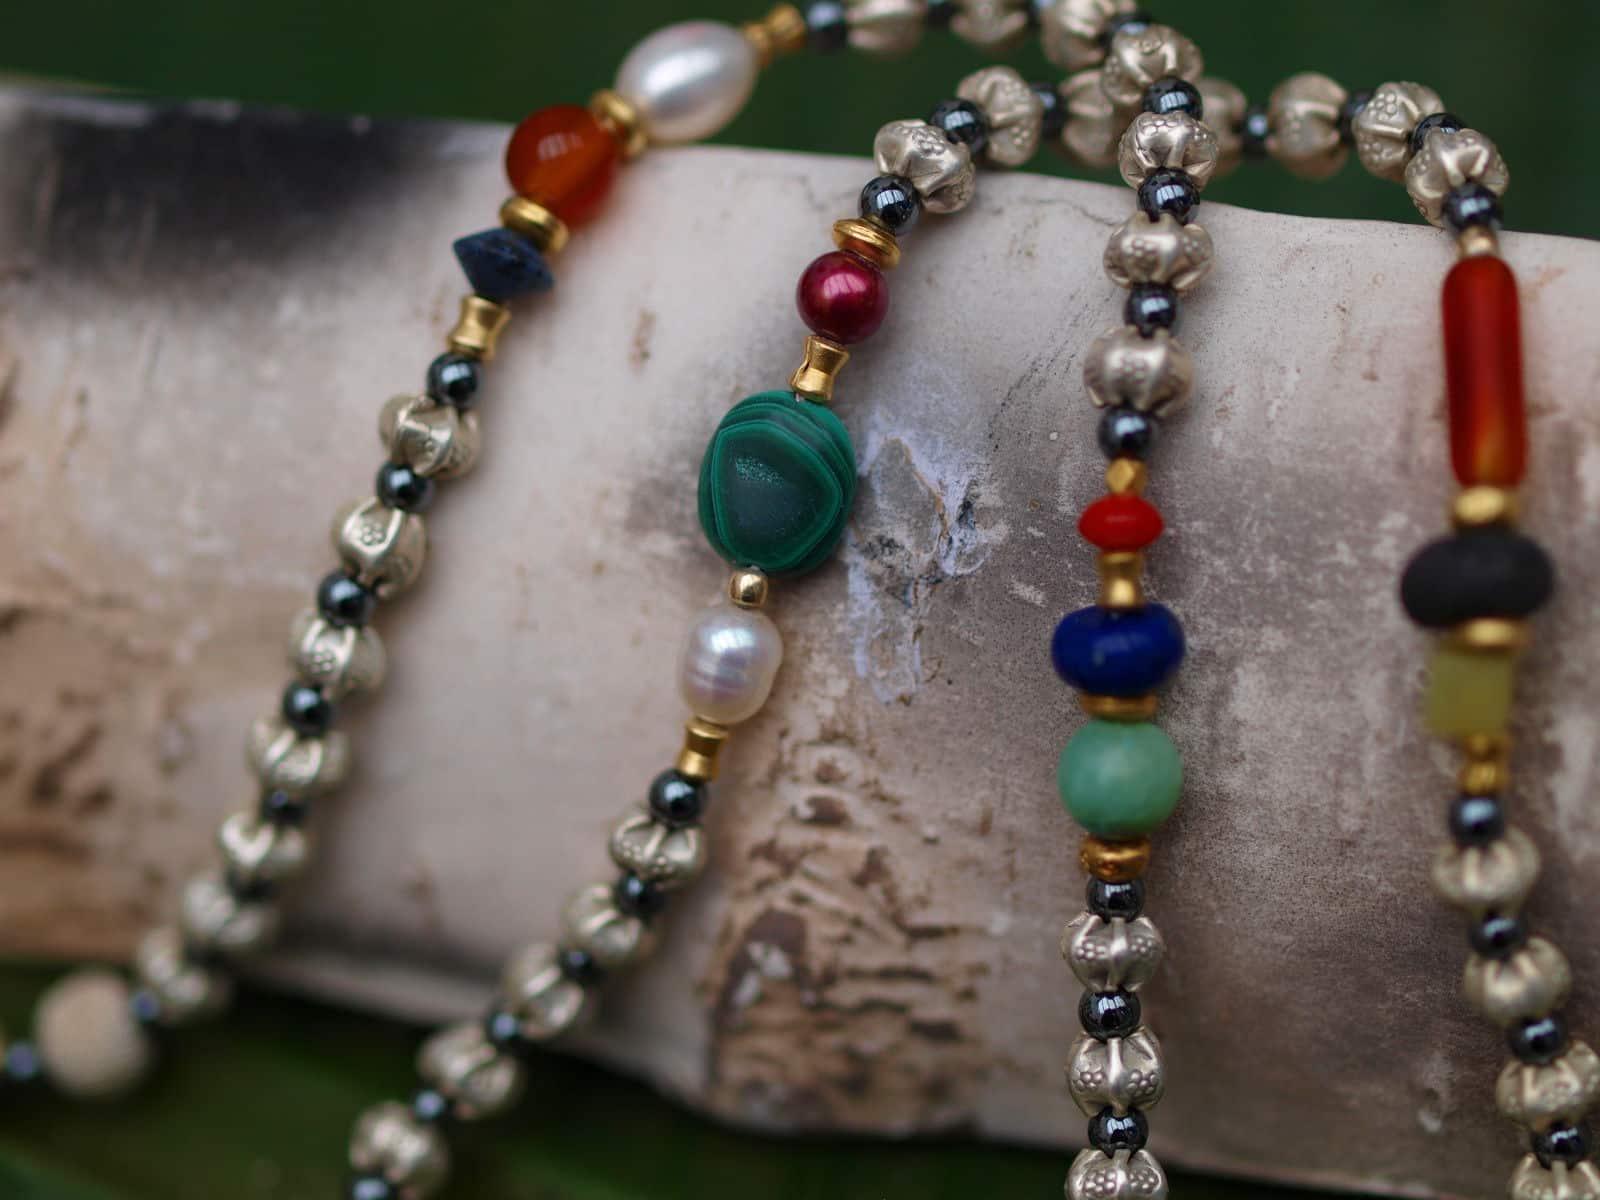 Unikat Kette Silber 925 tlw vergoldet Hämatit diverse Halbedelsteine Perlen lang